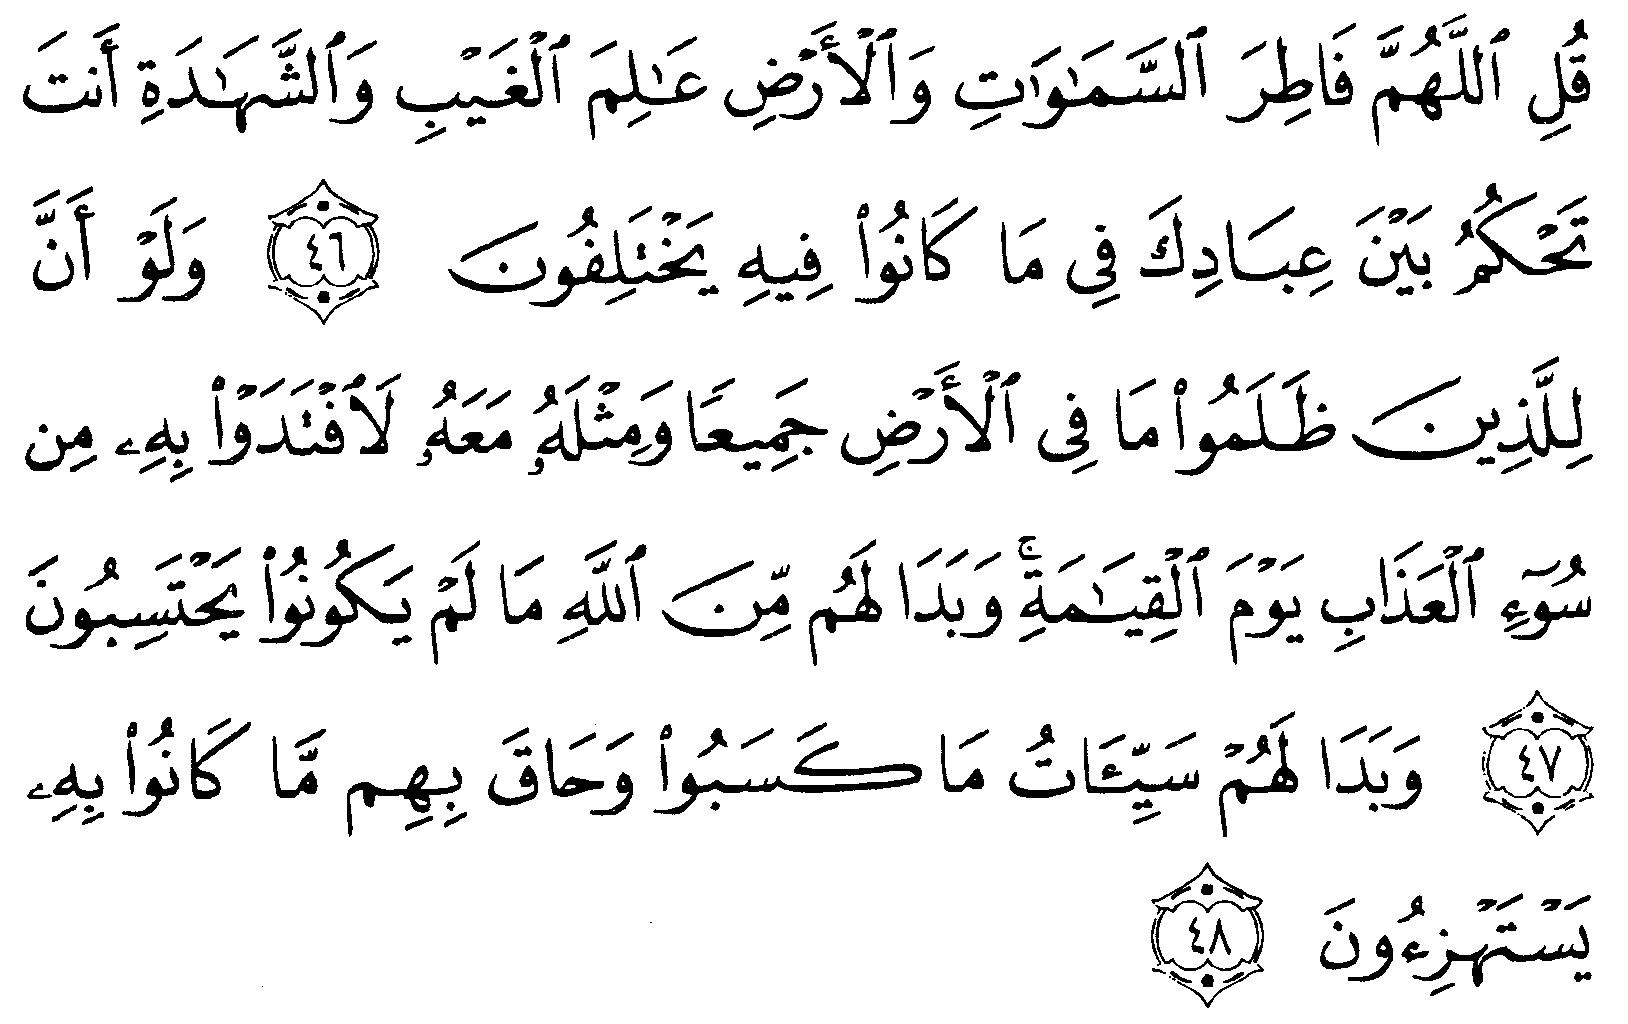 Tafsir Ibu Katsir Surah Az Zumar 11 Alquranmulia